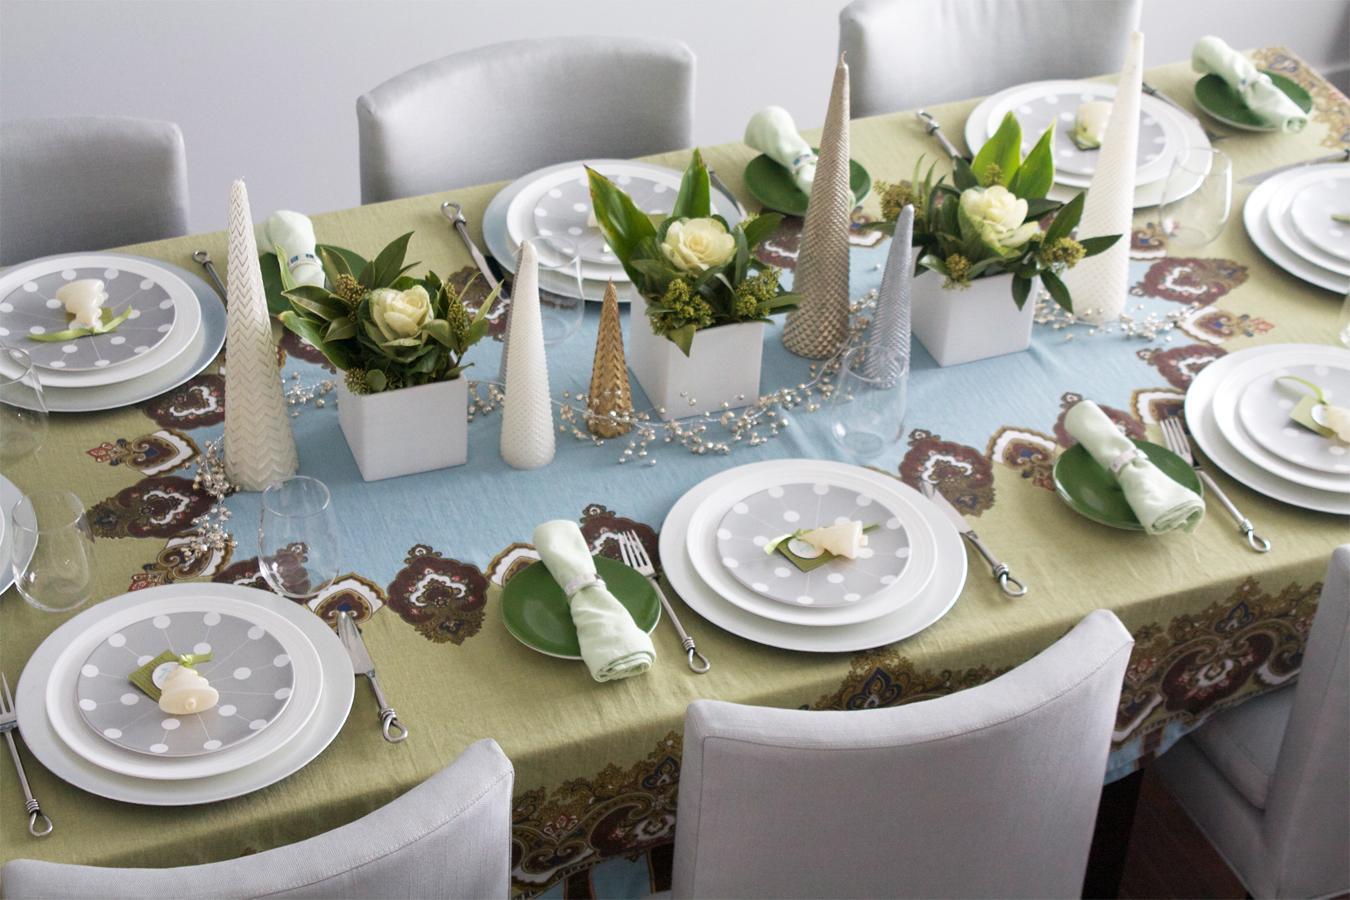 بشفافية مدرس منقي ترتيب طاولات الطعام بالصور Cazeres Arthurimmo Com